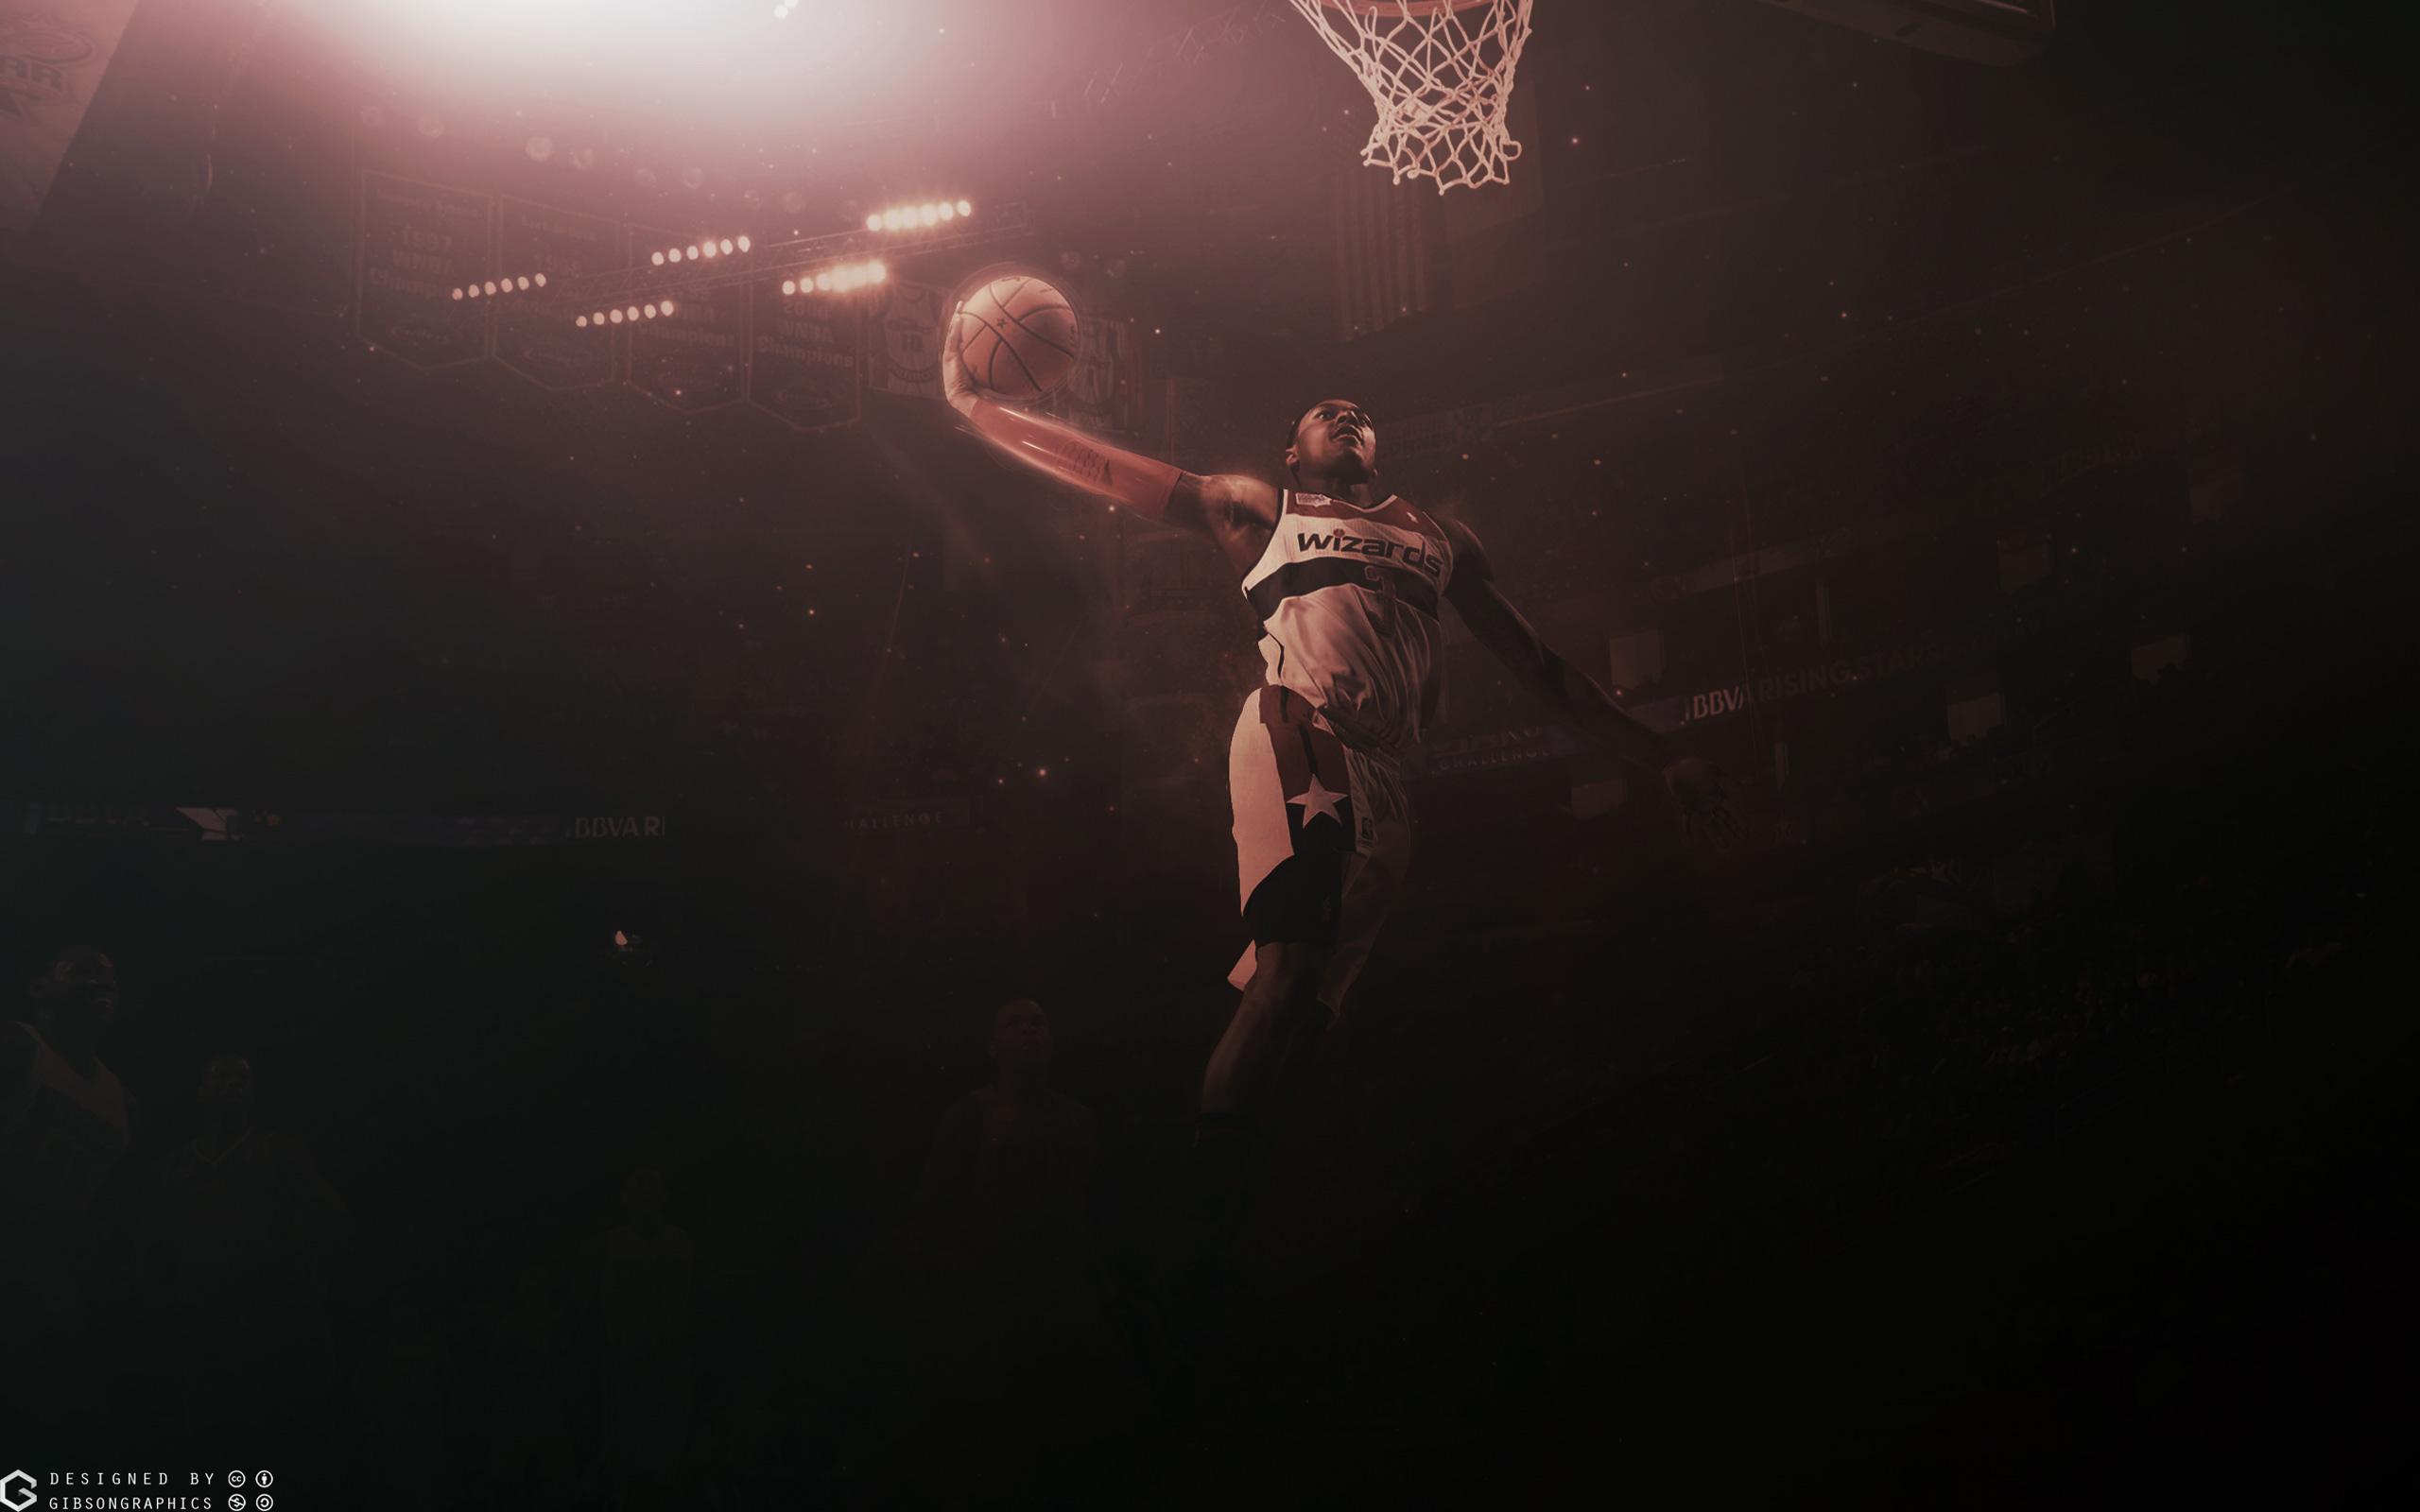 Bradley Beal Wizards Dunk 2015 Wallpaper Basketball Wallpapers At